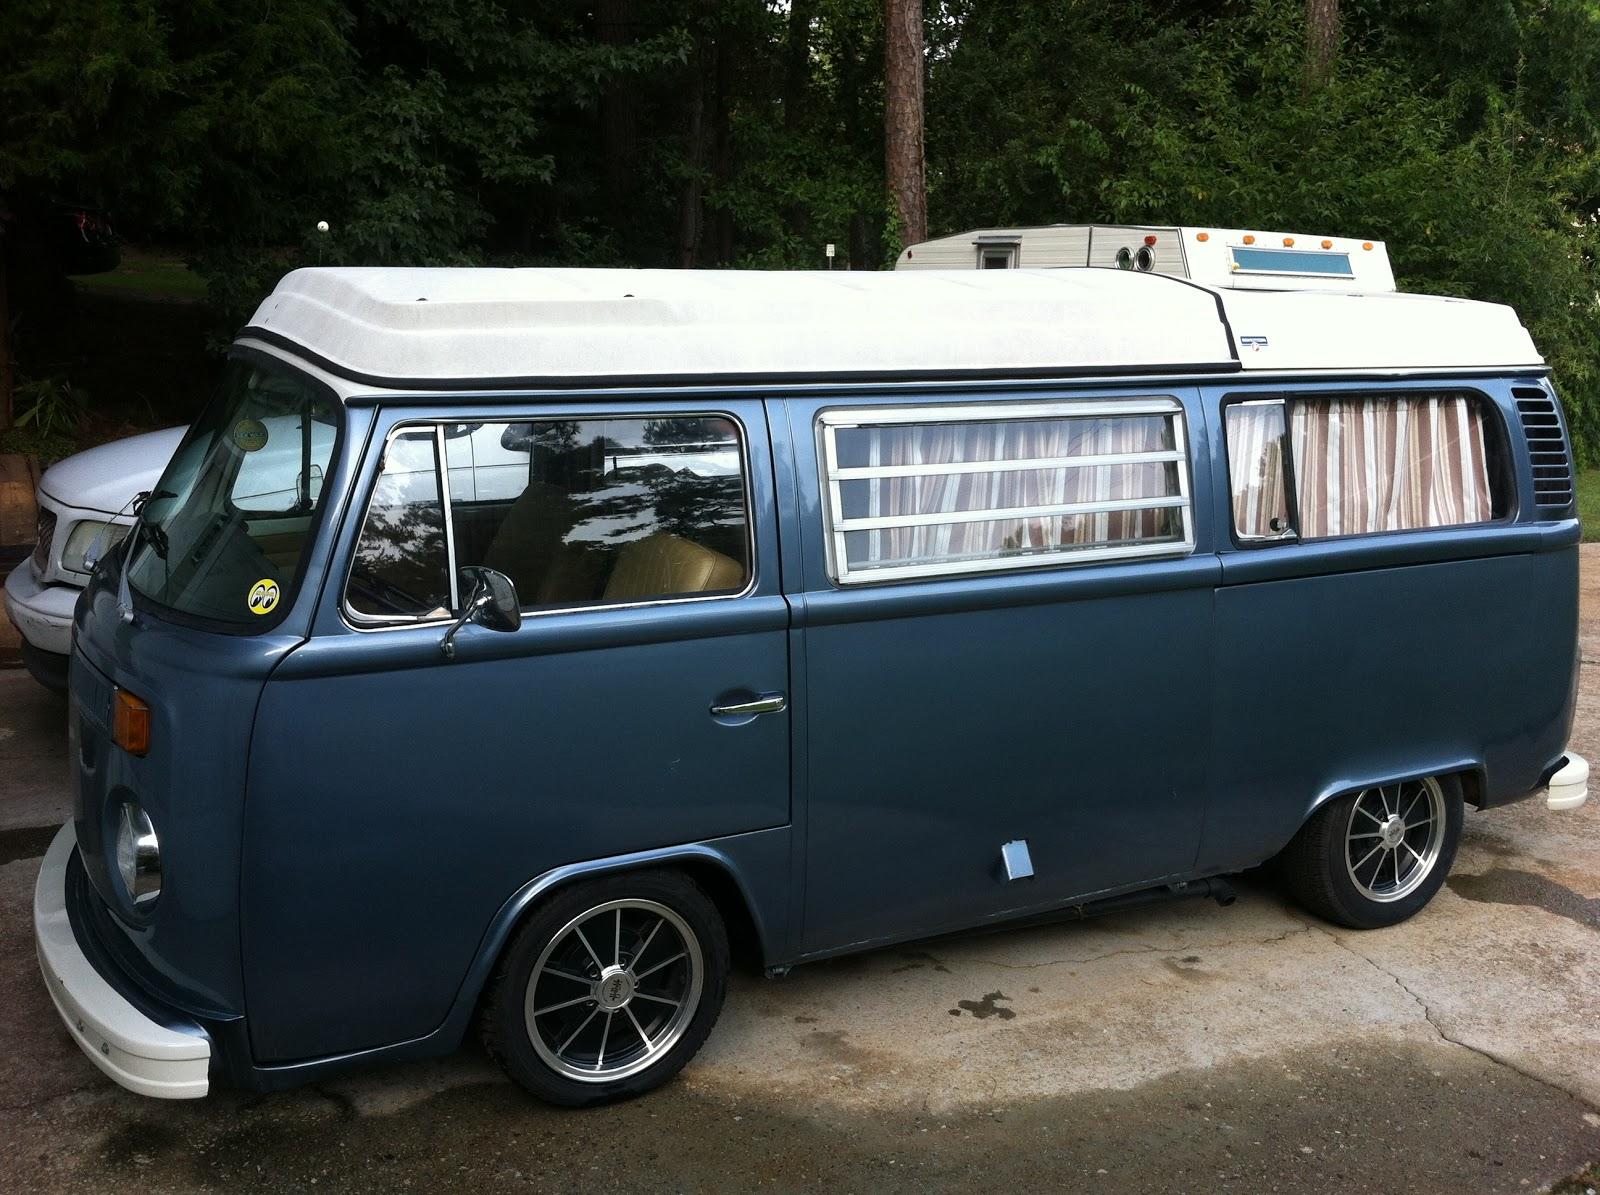 e 39 s autos surrey classic car specialist aircooled and. Black Bedroom Furniture Sets. Home Design Ideas